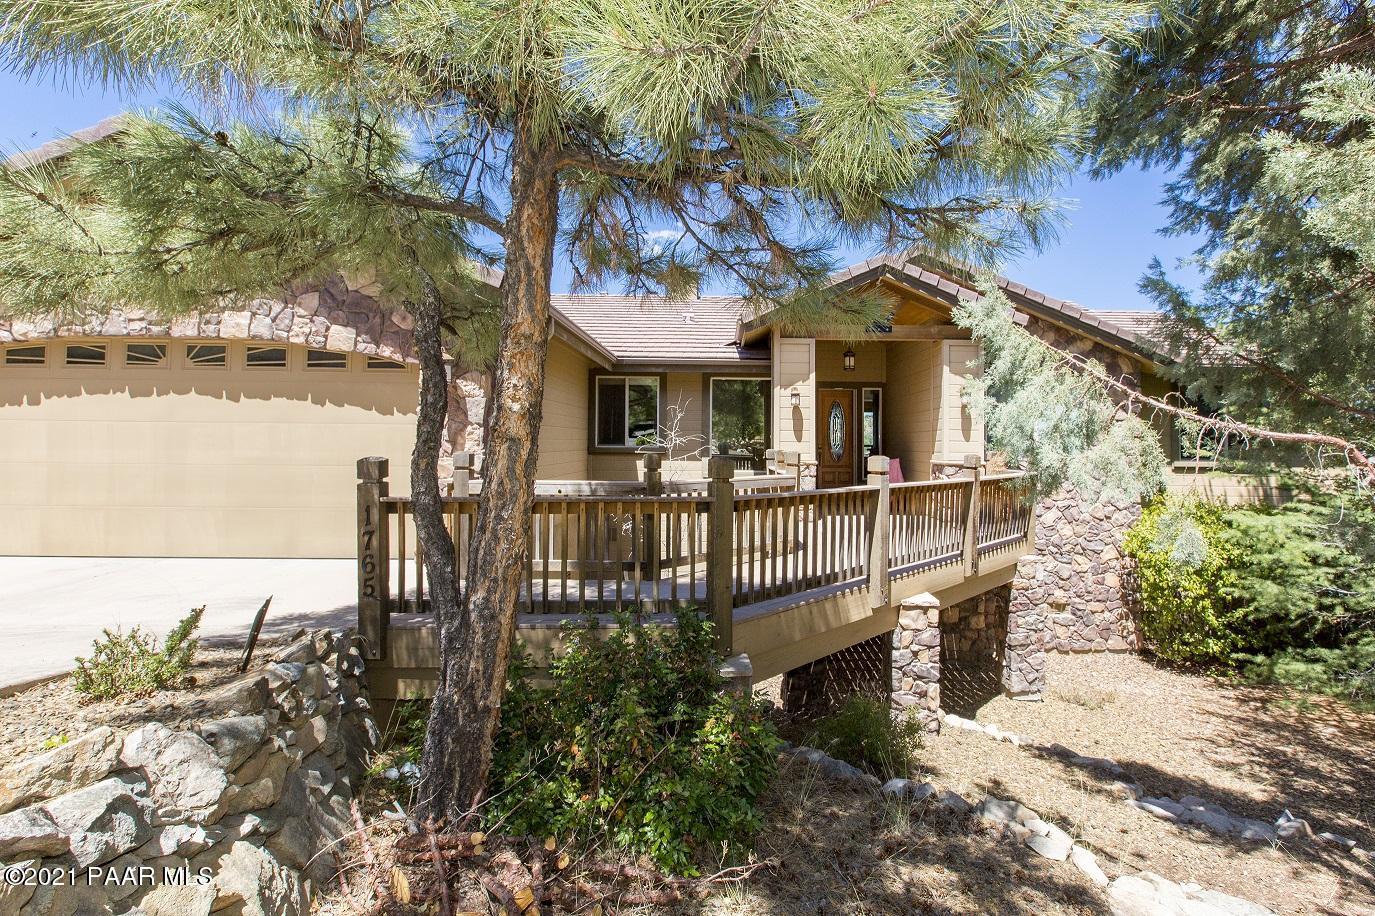 Photo of 1765 Twin, Prescott, AZ 86305